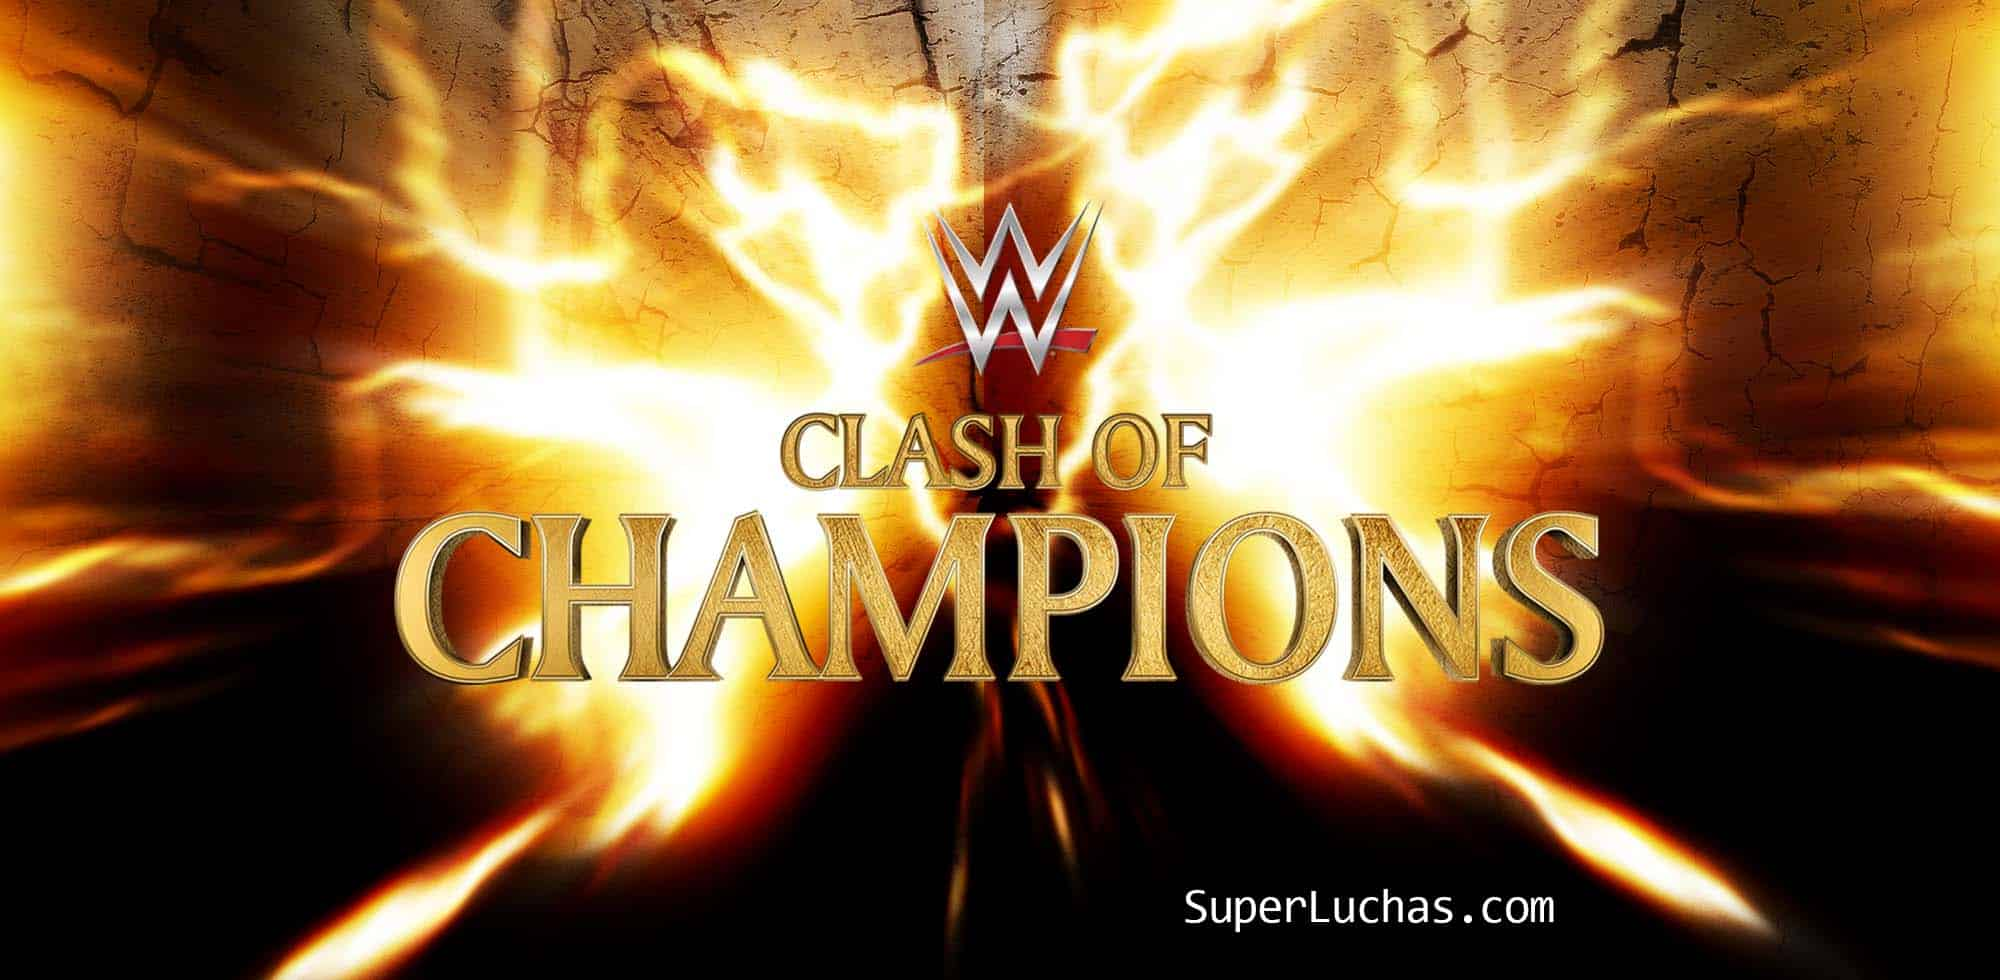 Novedades sobre el cartel de Clash of Champions 2019 1